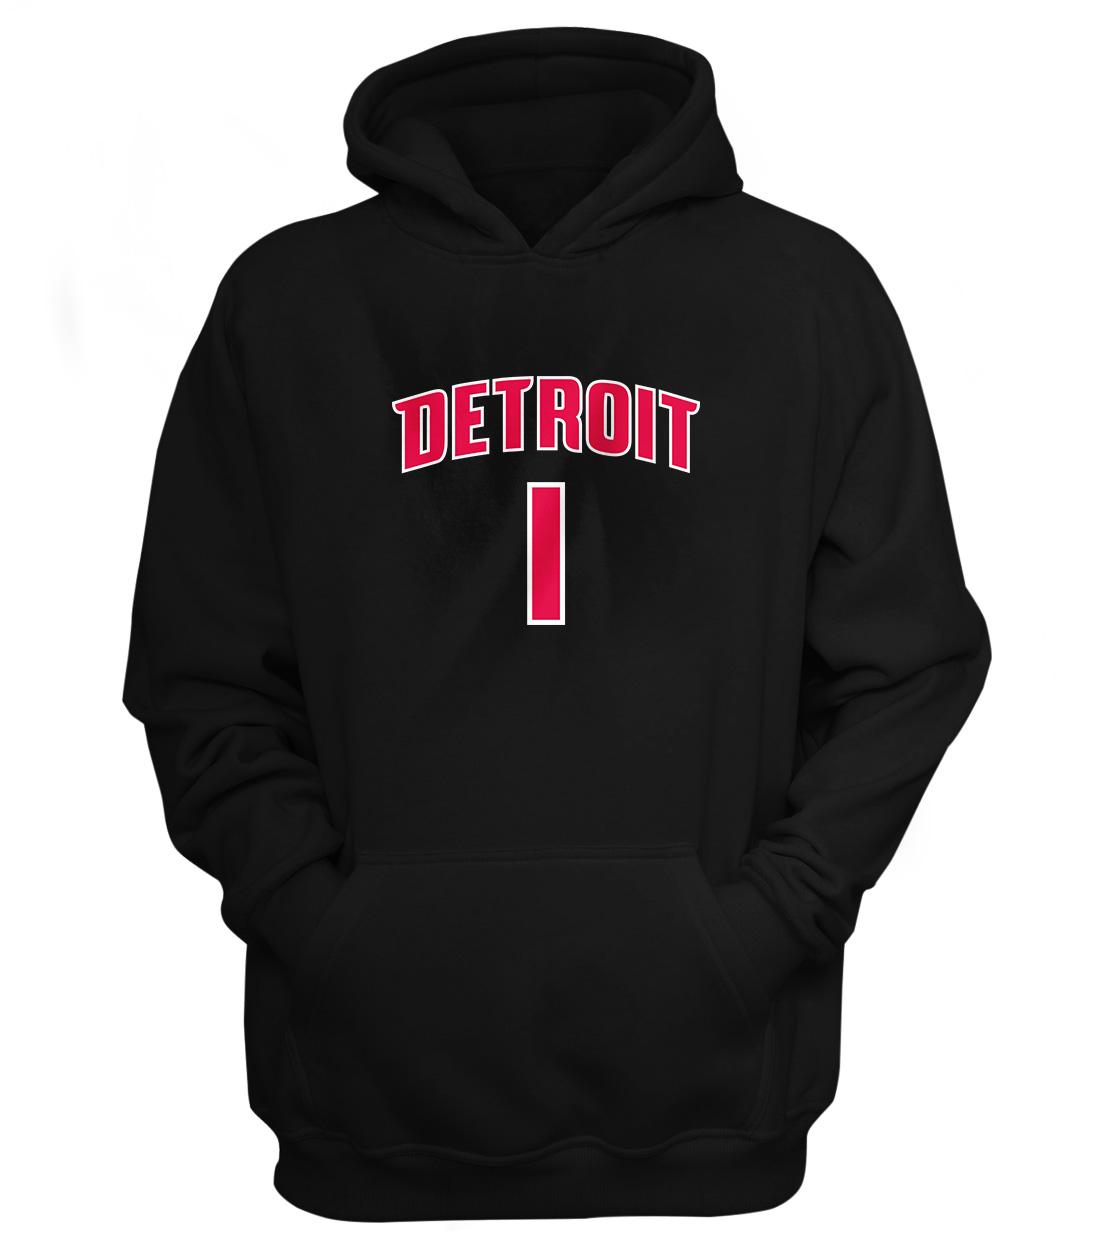 Detroit Pistons Chauncey Billups Hoodie (HD-BLC-NP-75-PLYR-DET-BILLUPS.FRM)